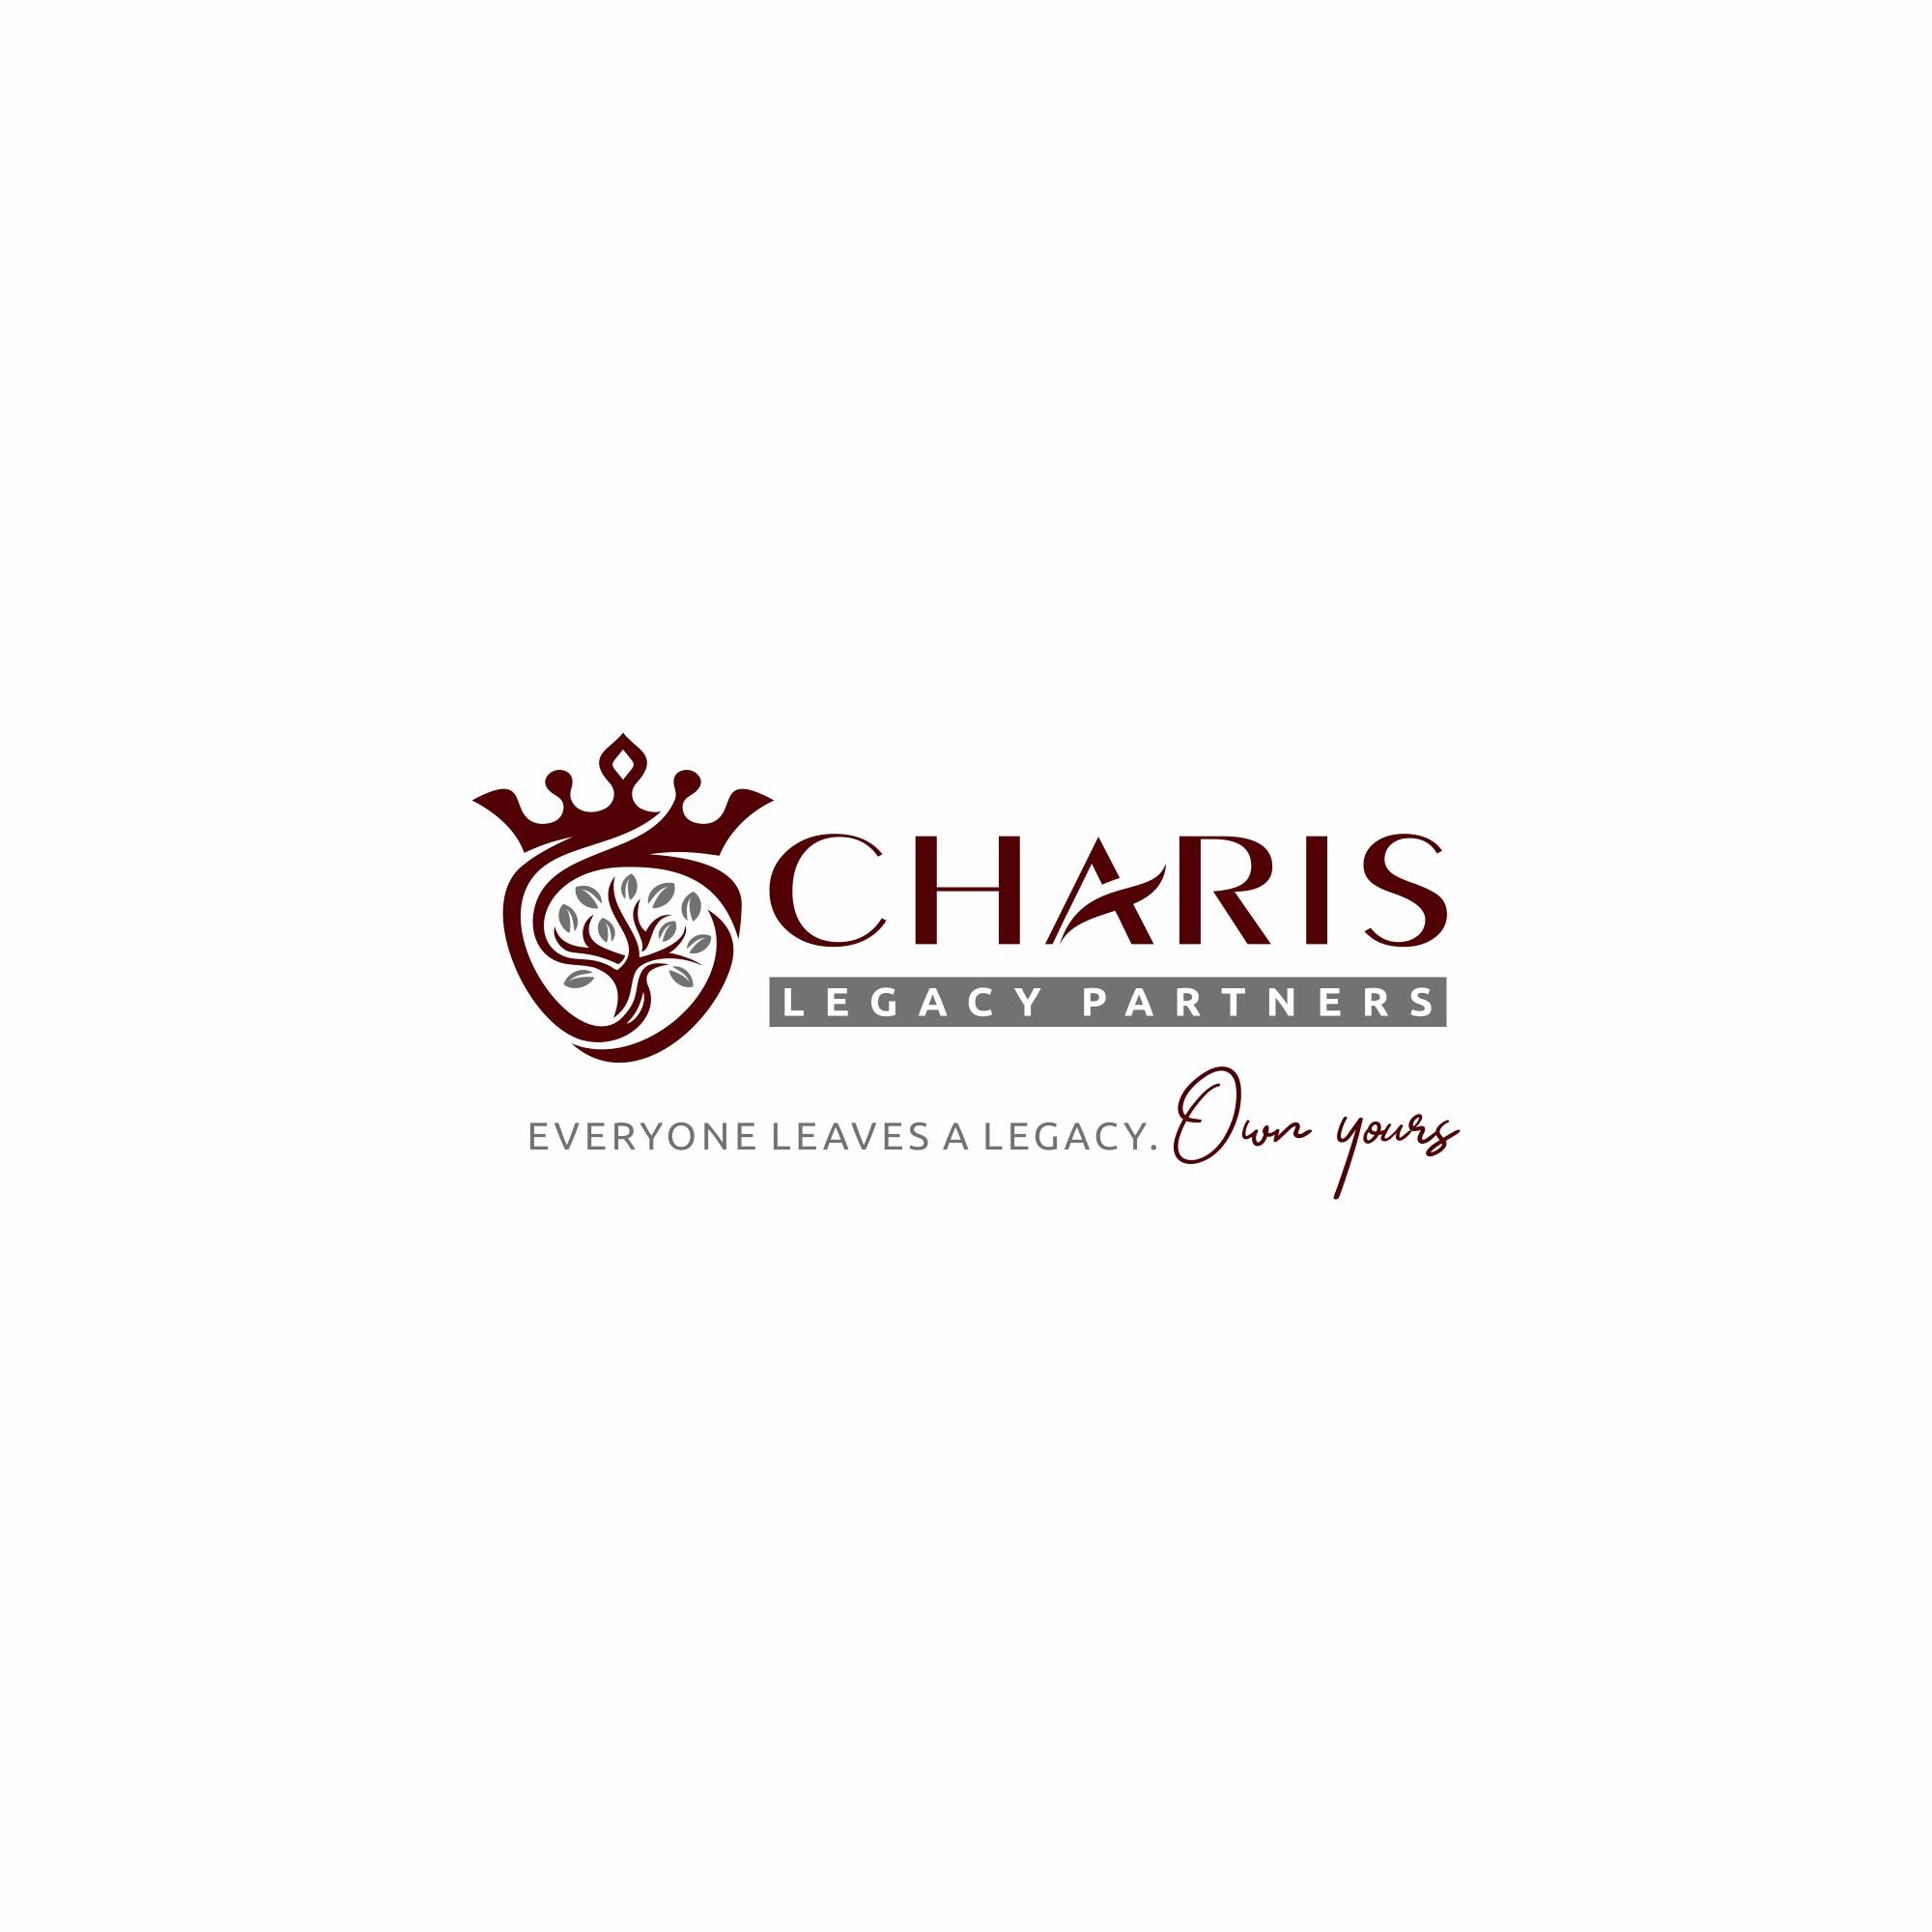 Charis Legacy Partners